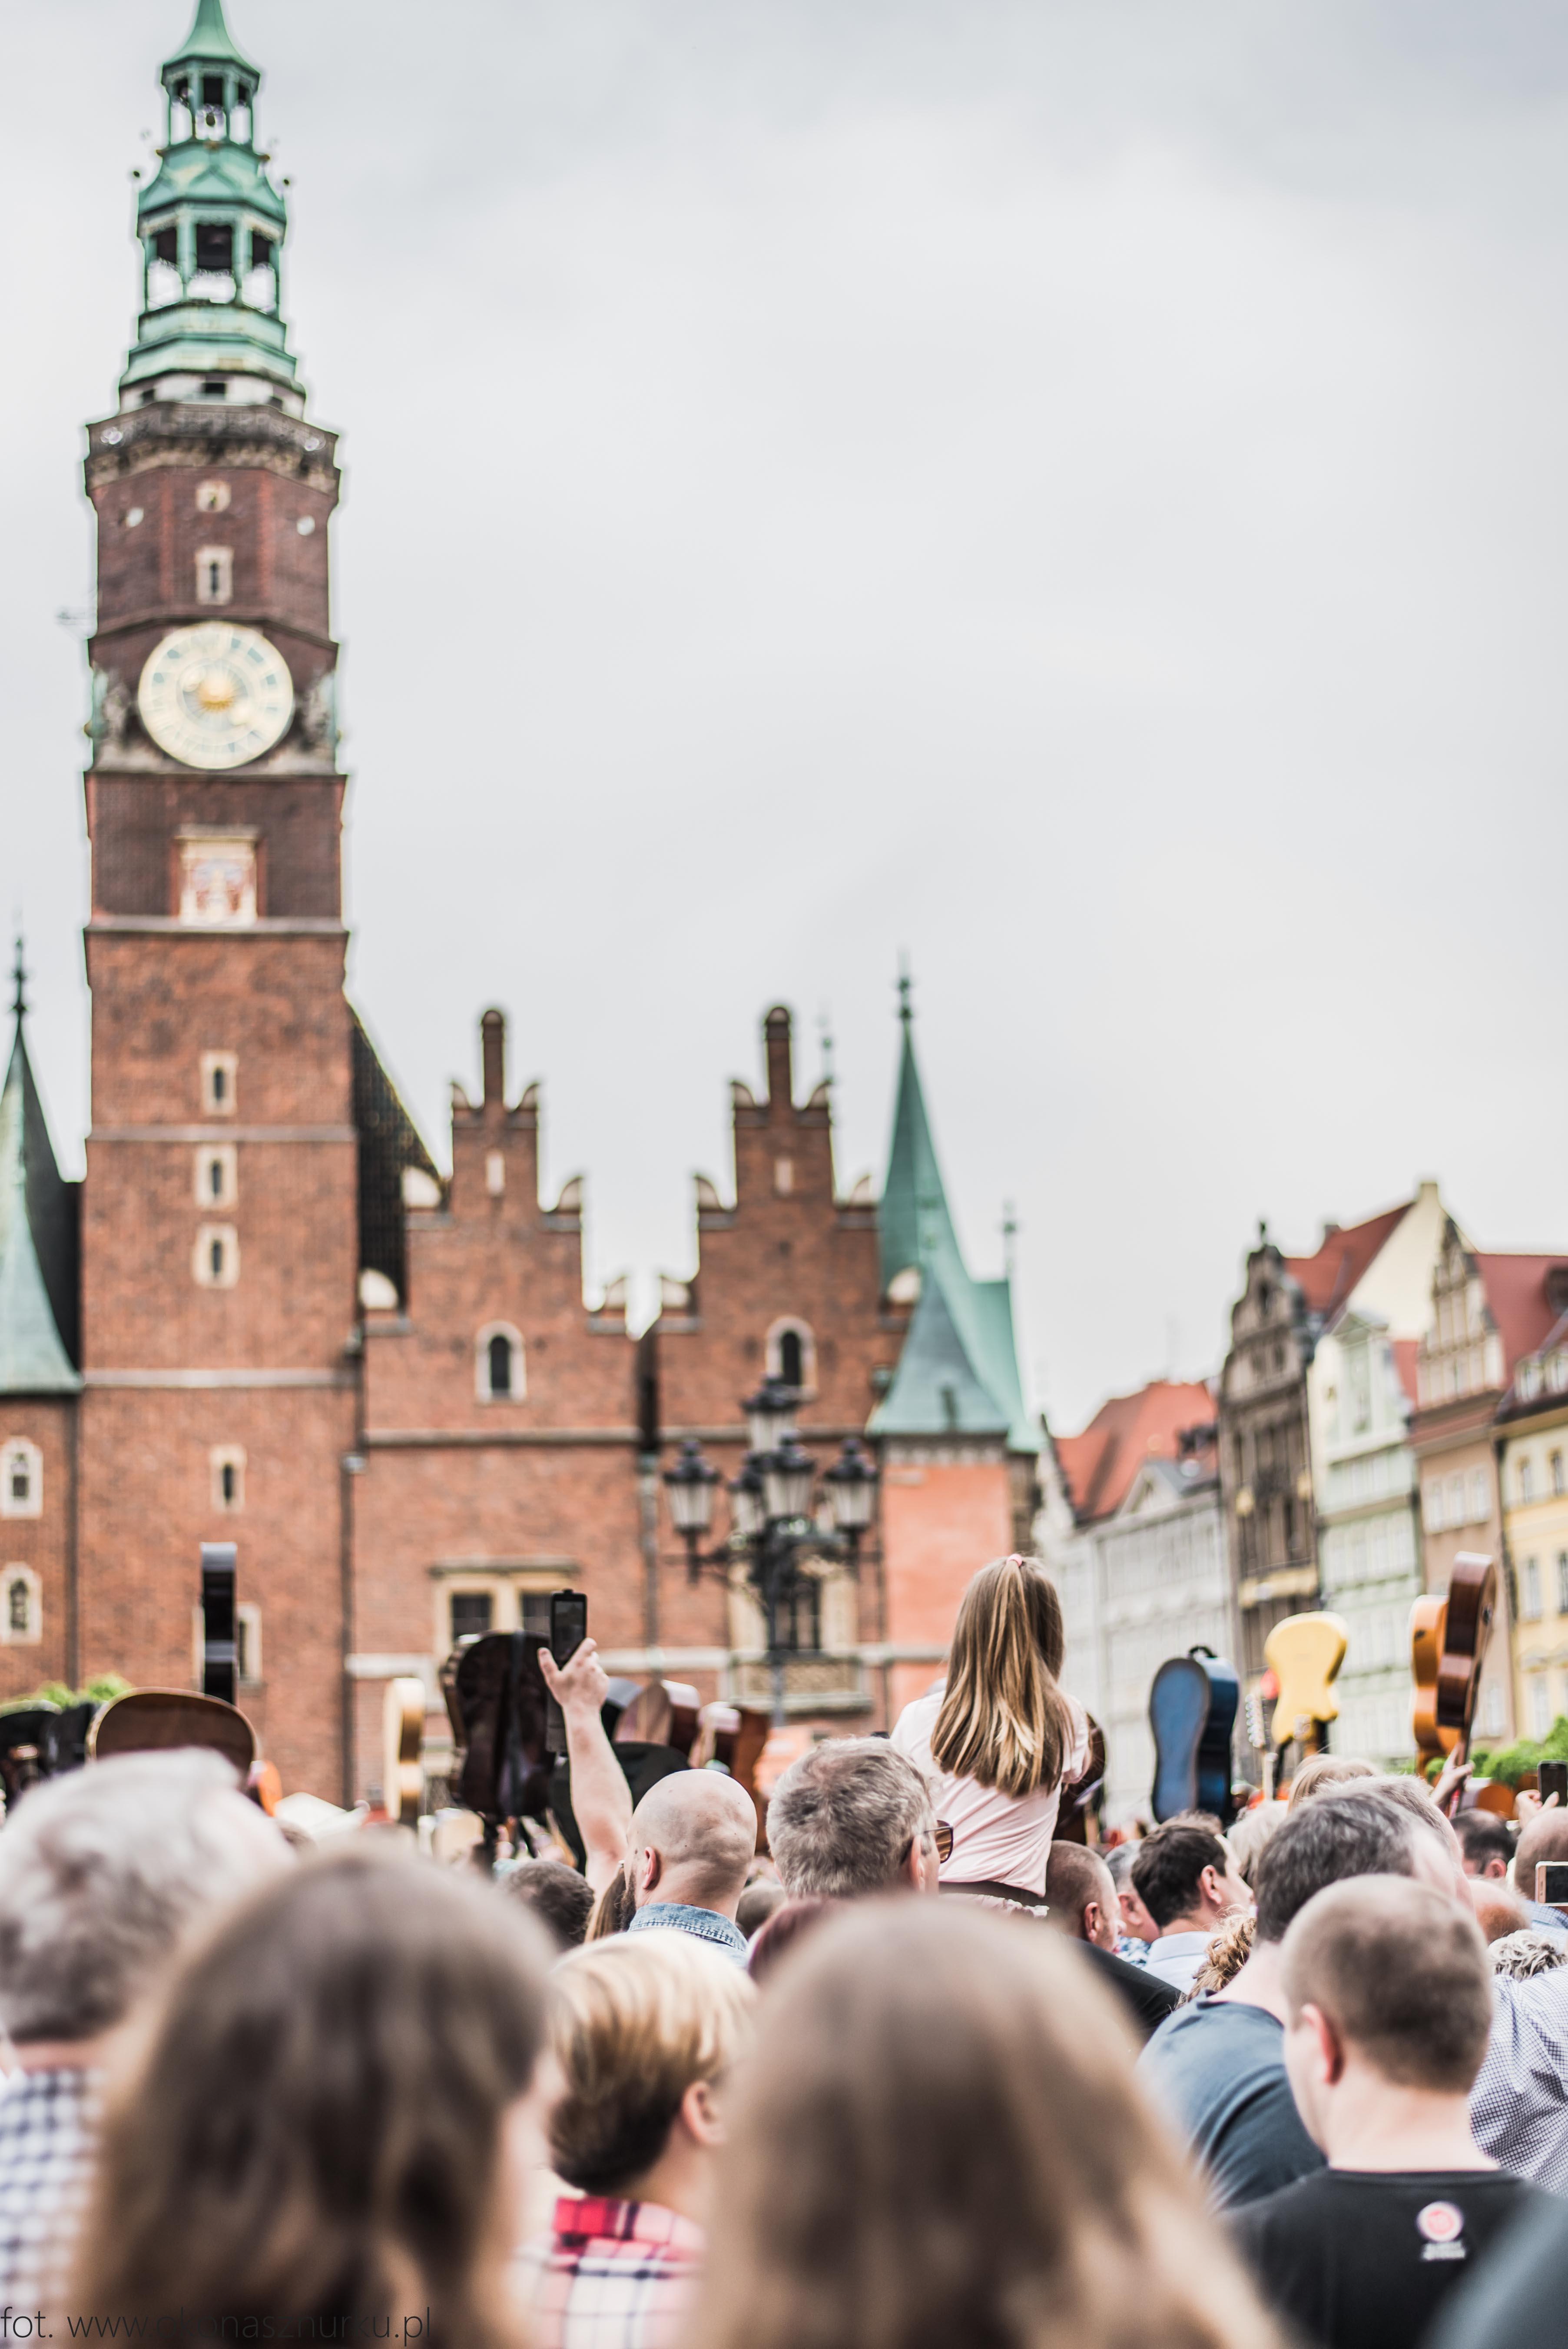 wroclawski-gitarowy-rekord-guinnessa-2018 (13)